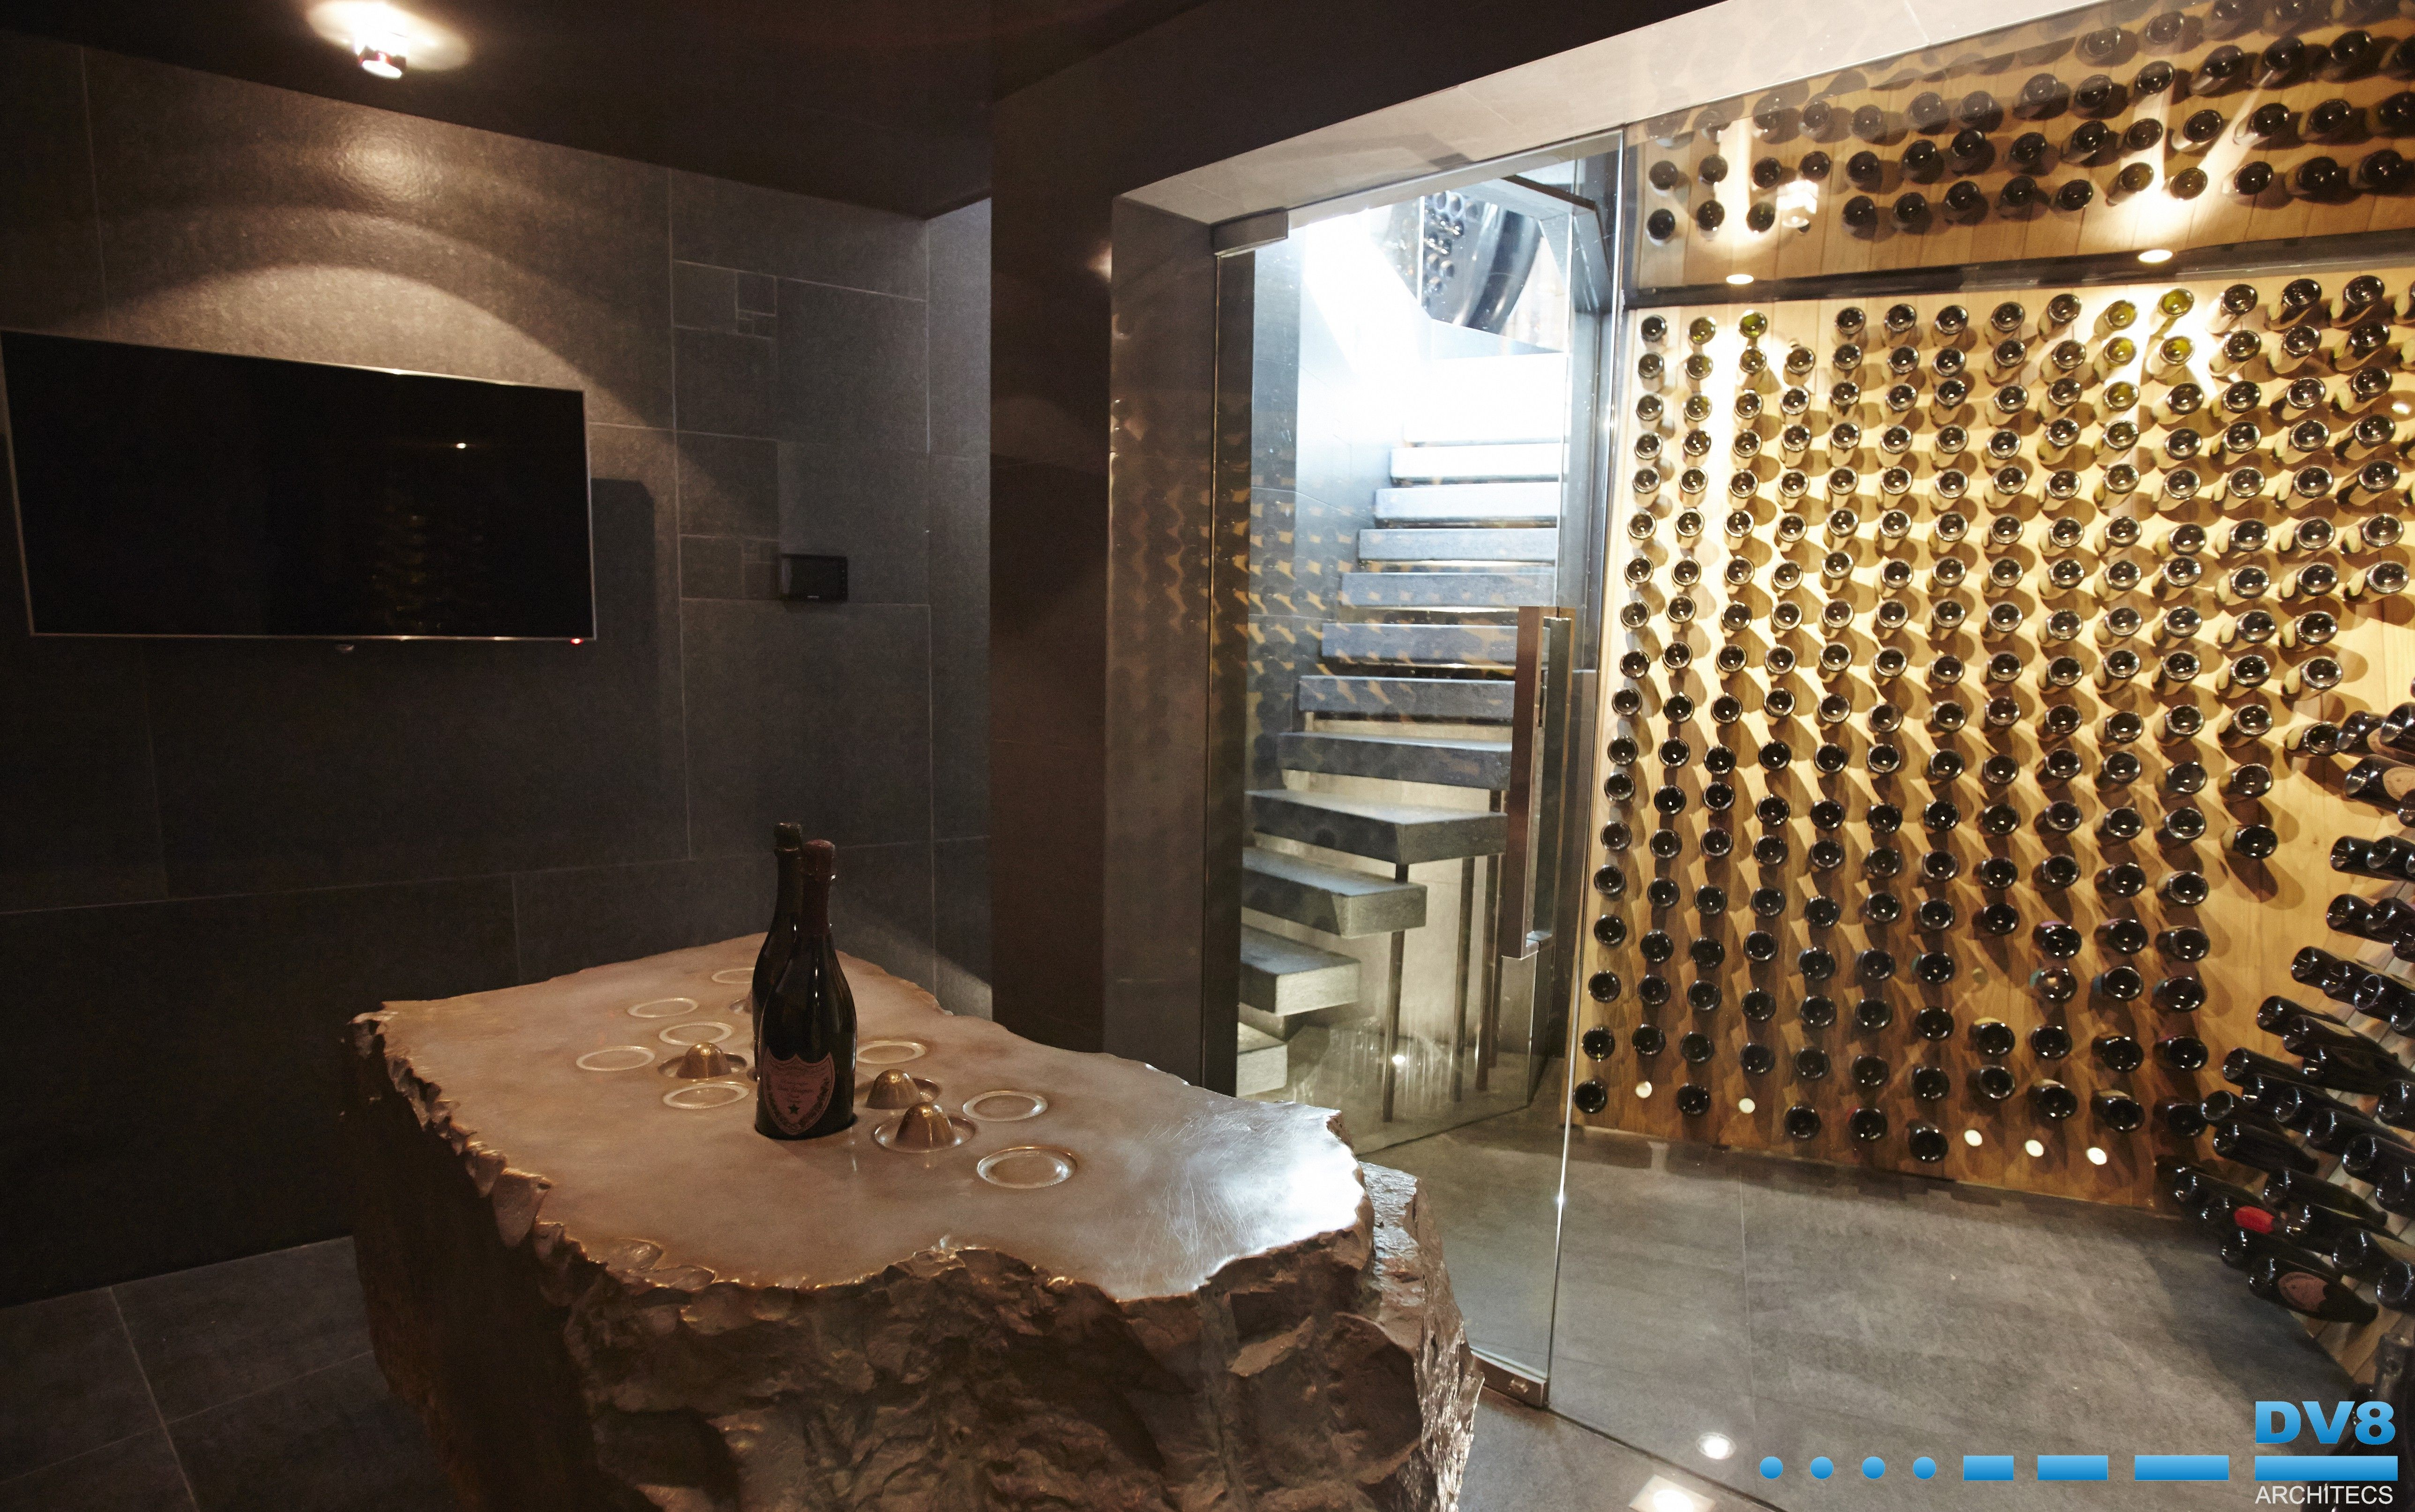 Ellerman House Wine Gallery Champagne Cellar Moet & Chandon Were